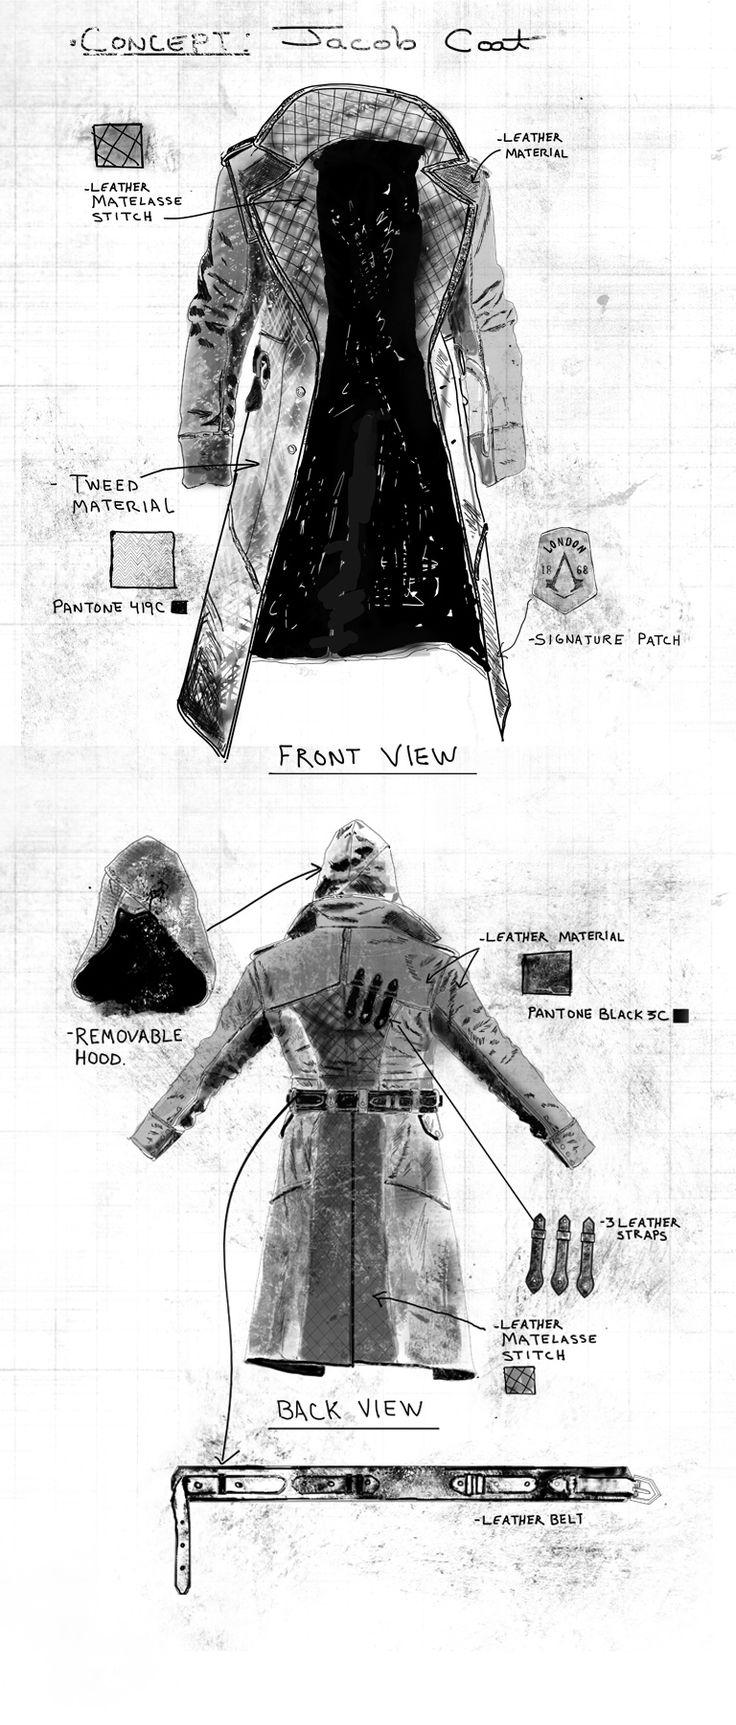 Assassinscreedsyndicate Jacob Coat Fantasy Weapons And